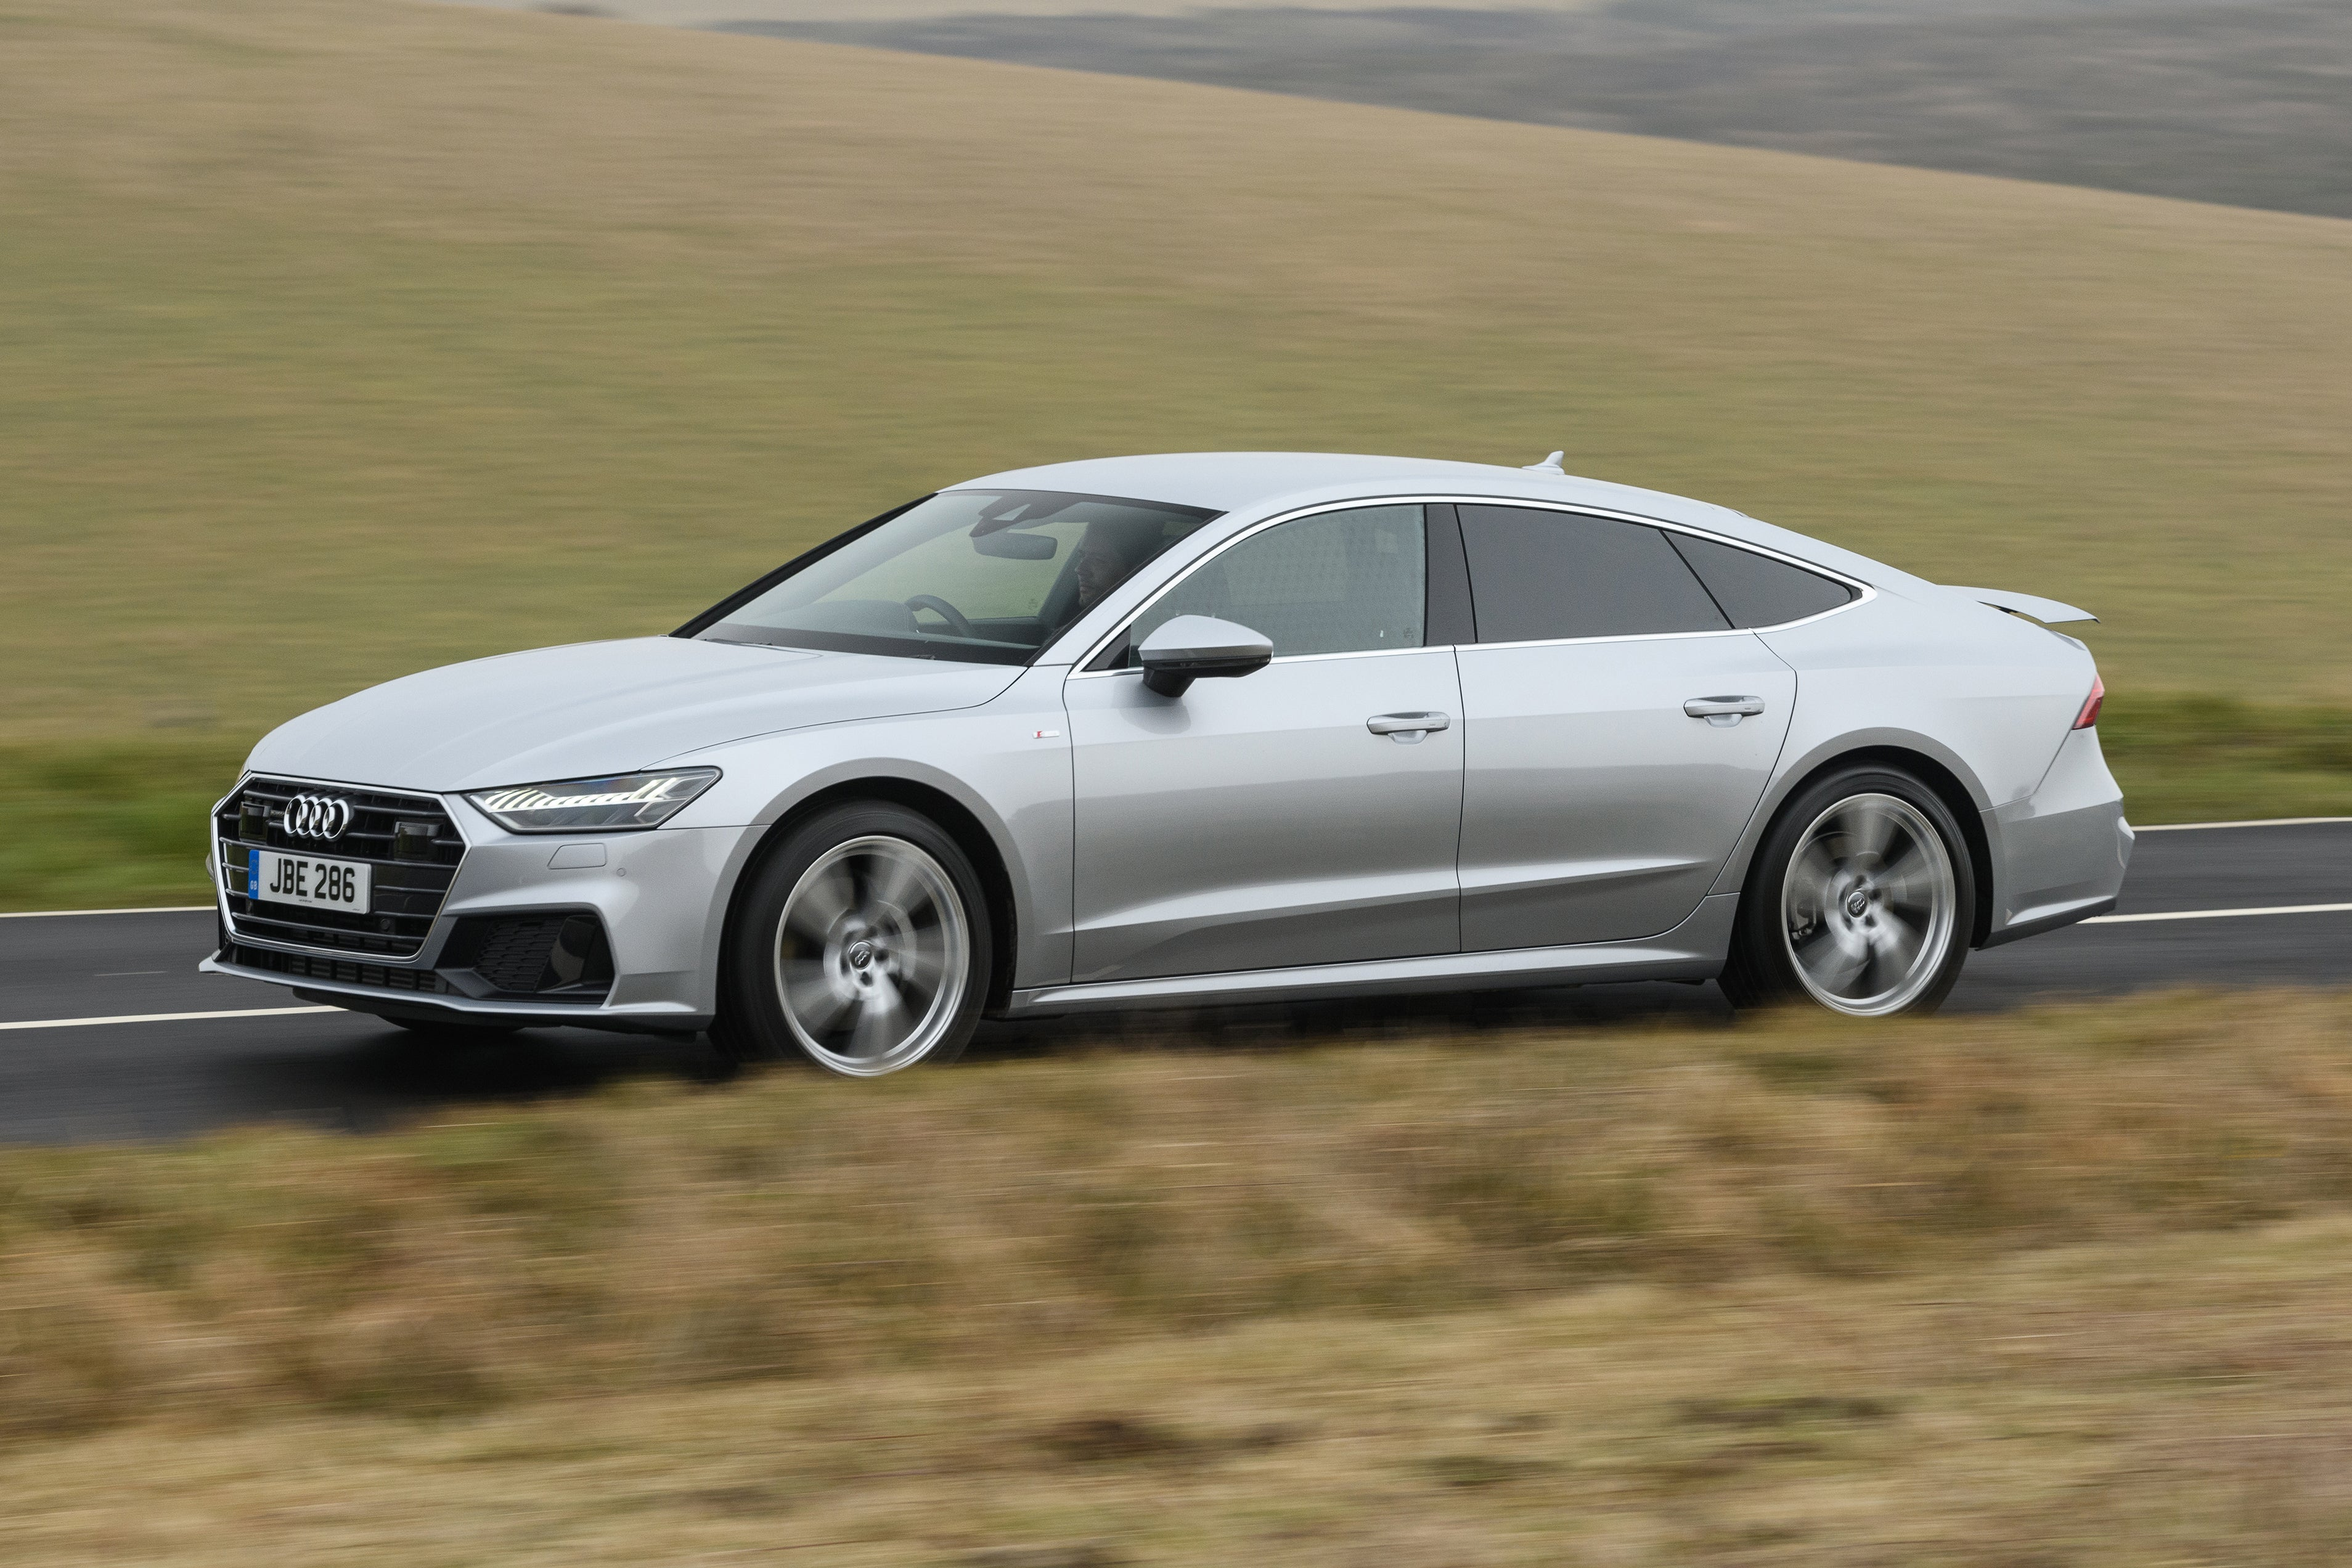 Audi A7 Sportback silver on road